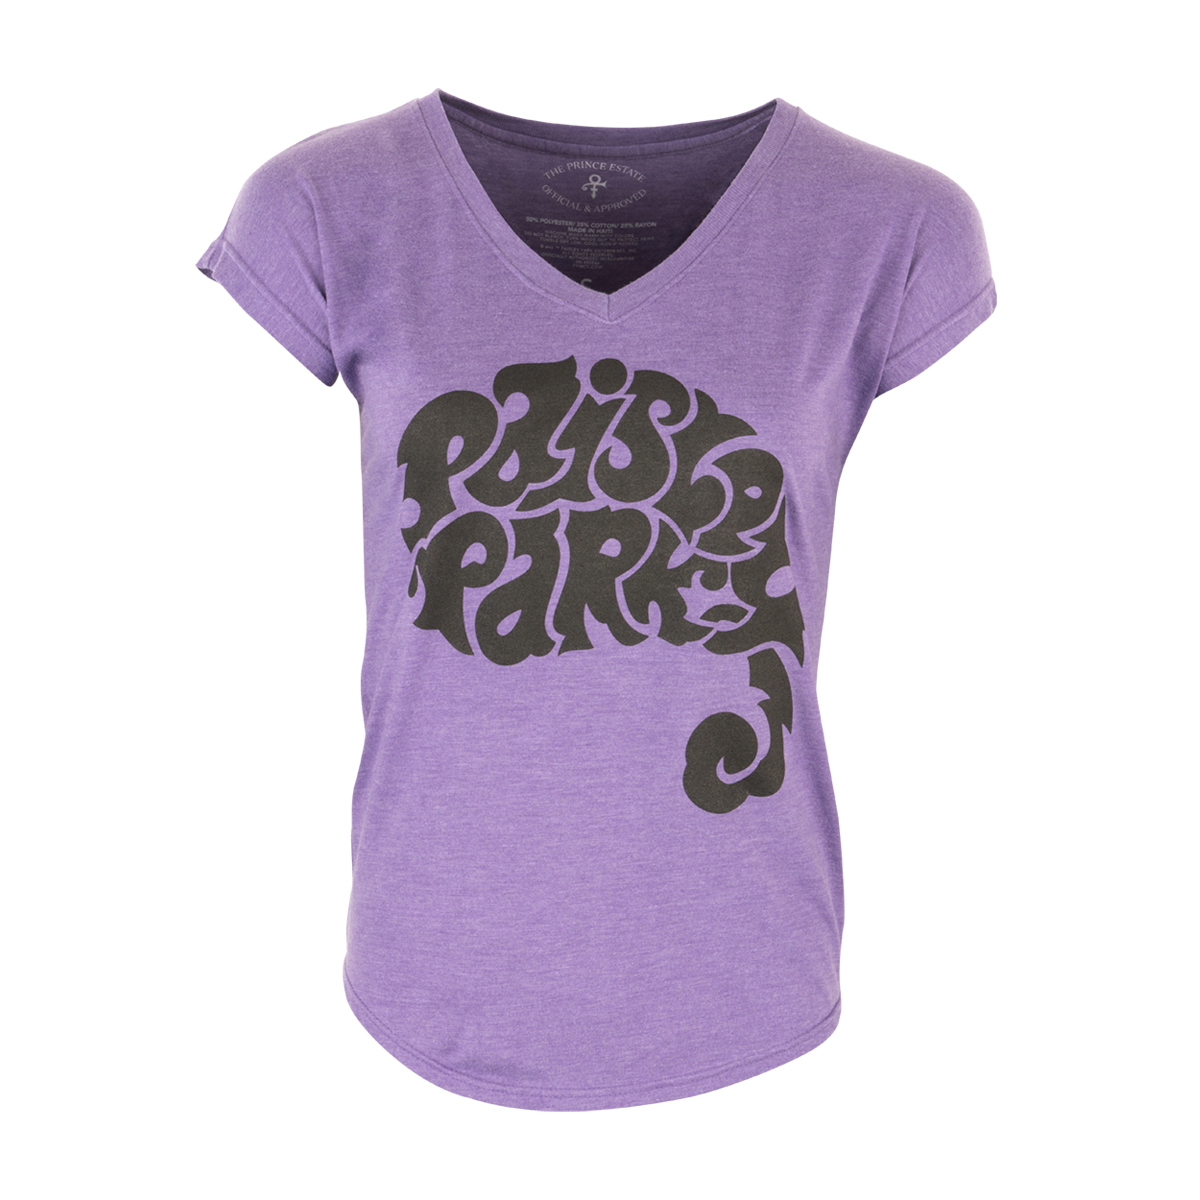 Paisley Park Logo Women's T-Shirt